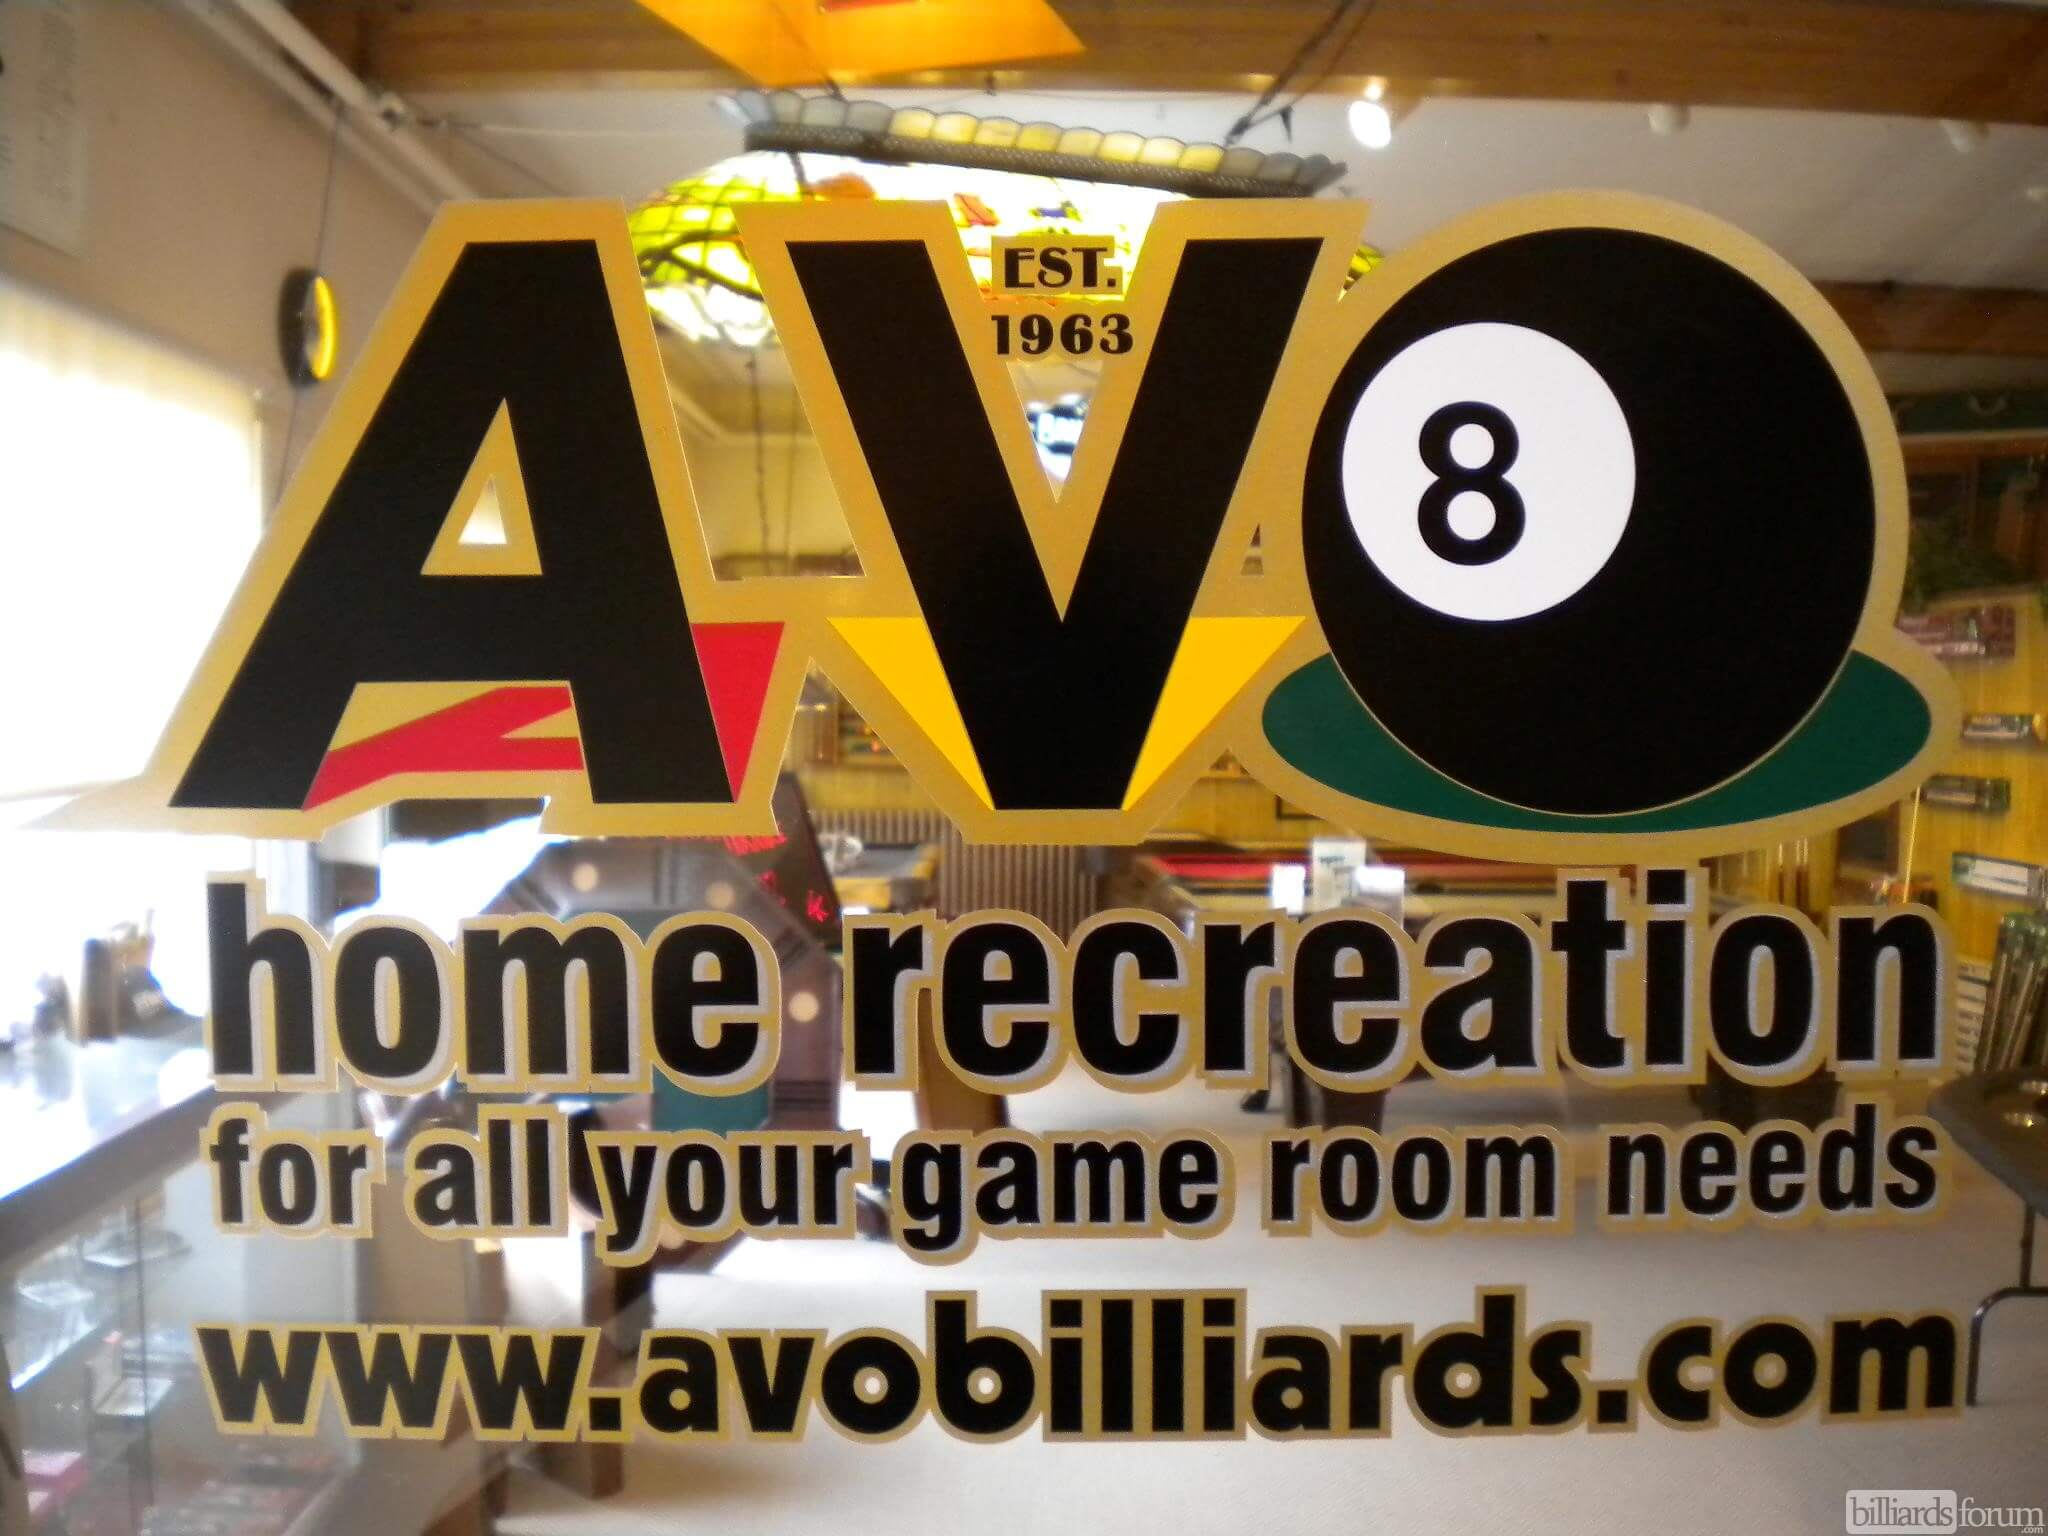 AVO Home Recreation Sign Winnipeg, MB